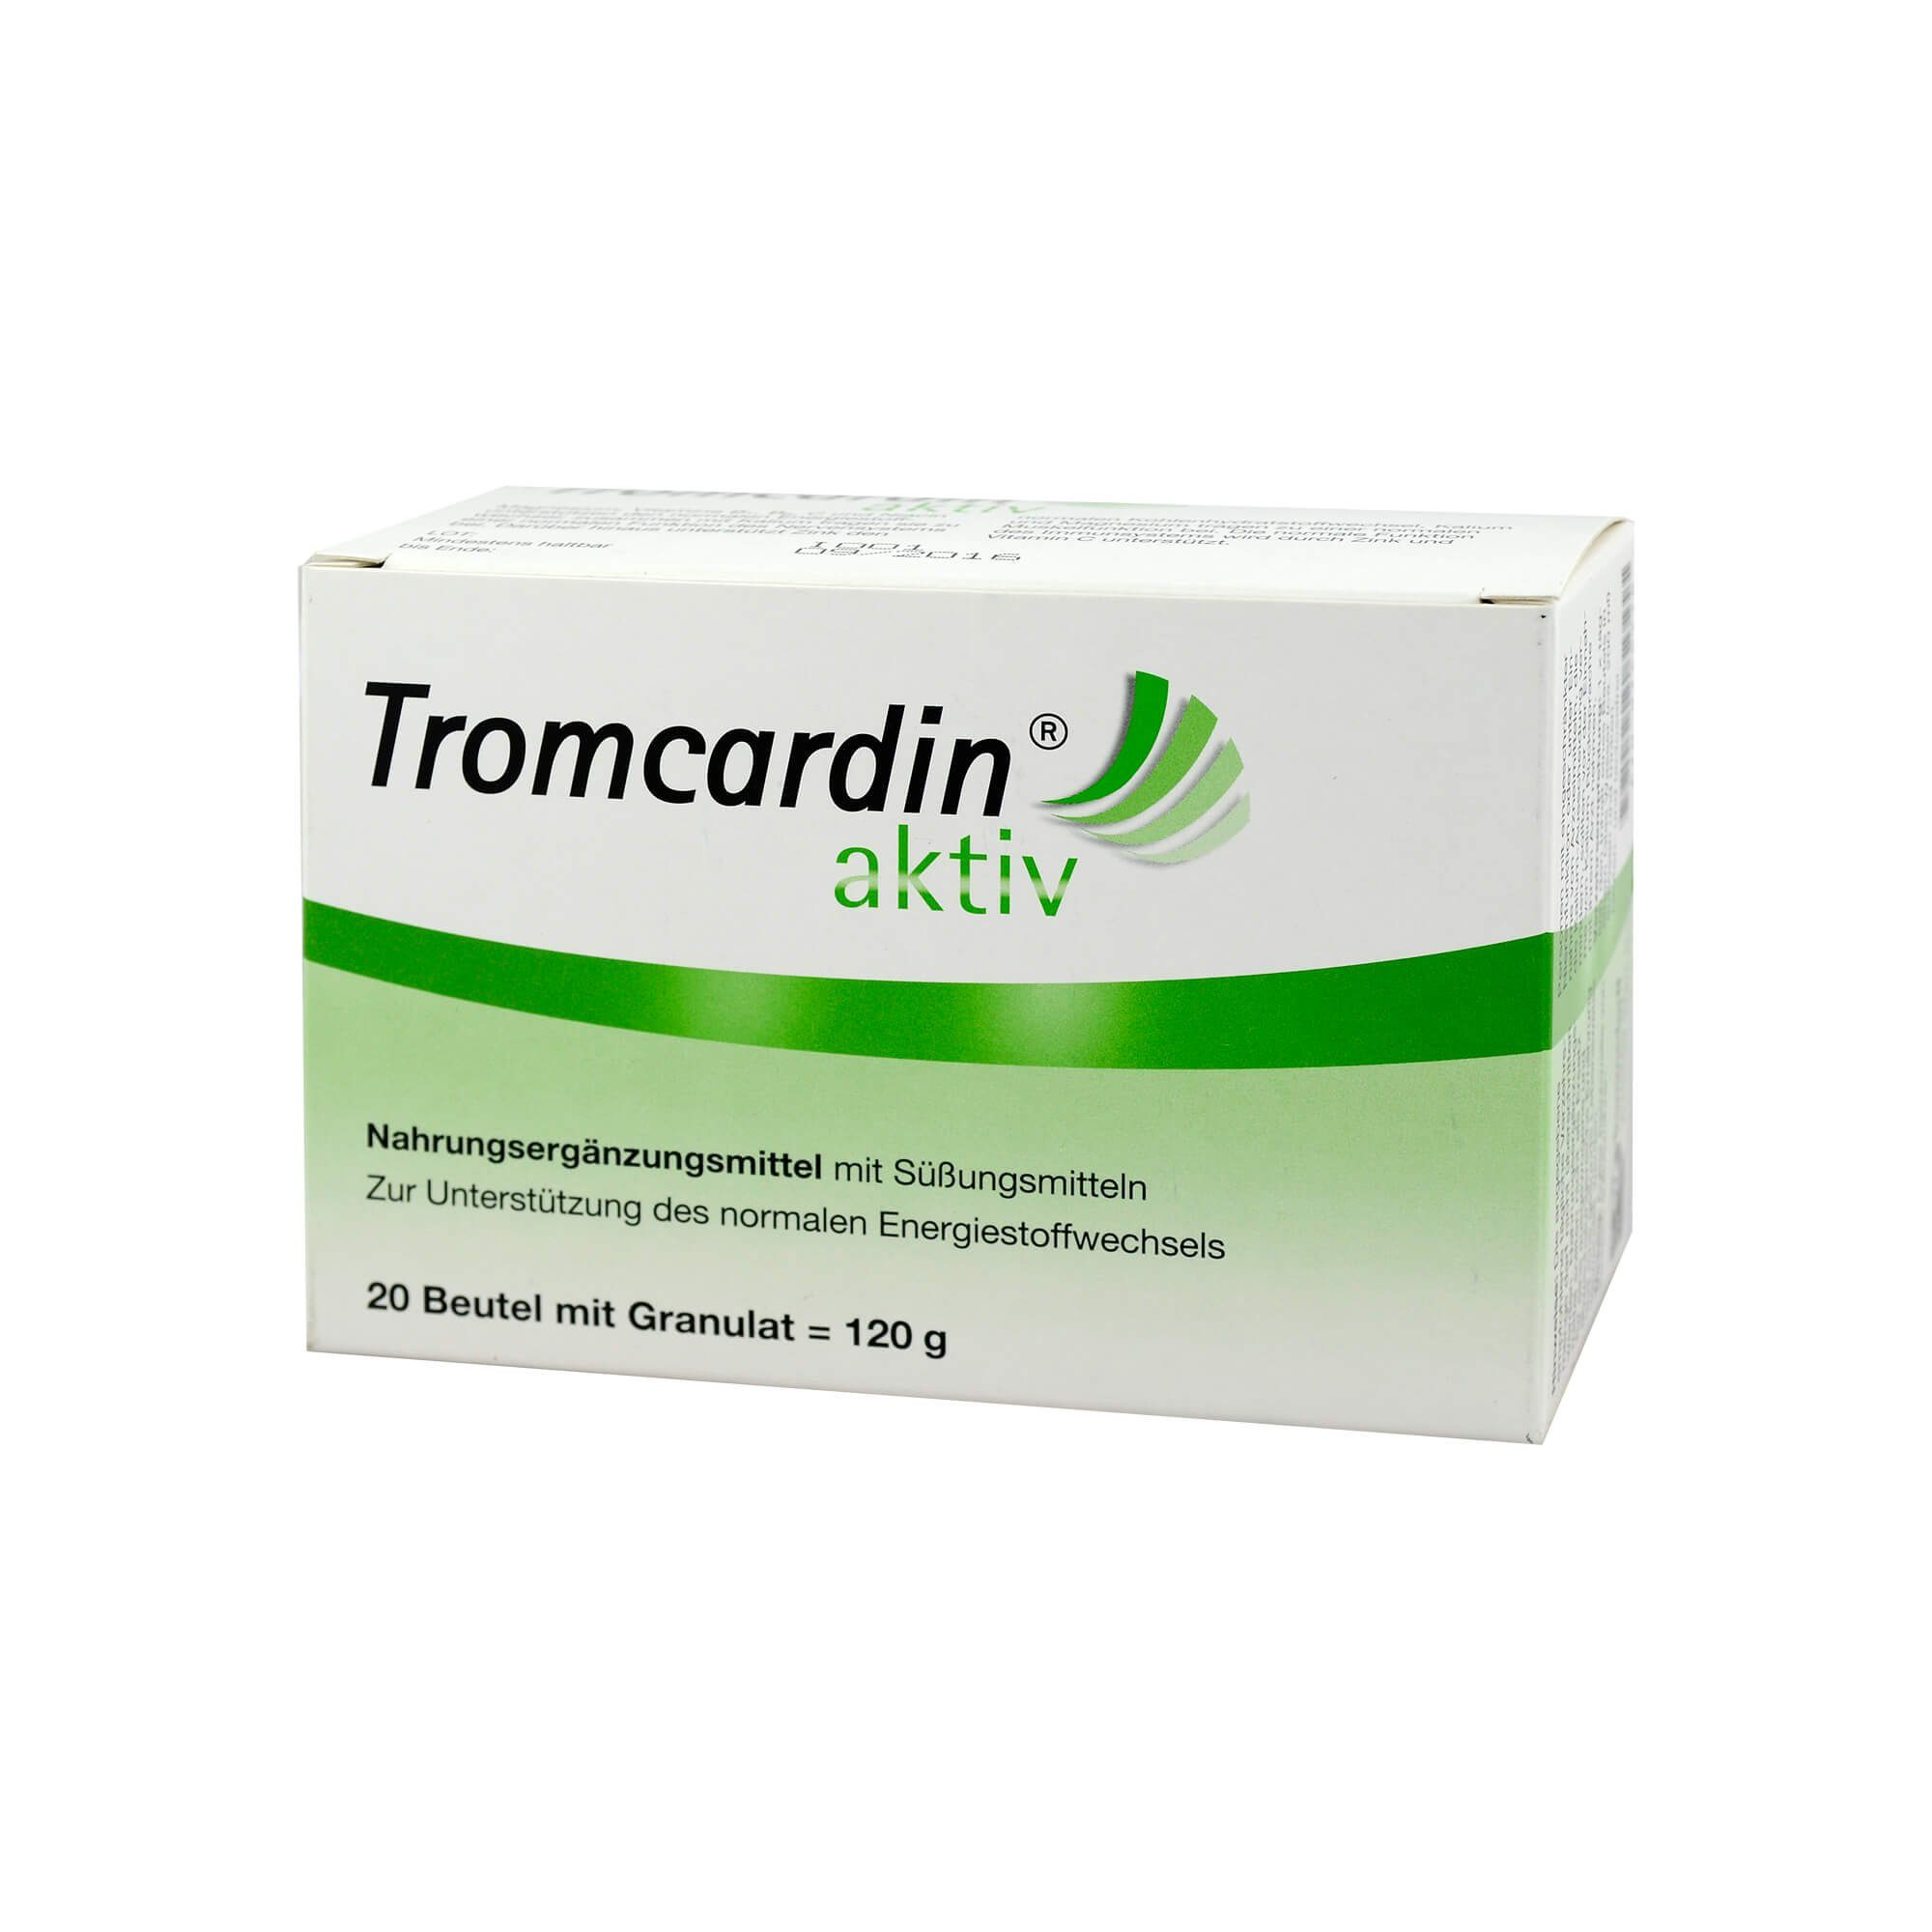 Tromcardin aktiv Granulat Beutel , 20 St